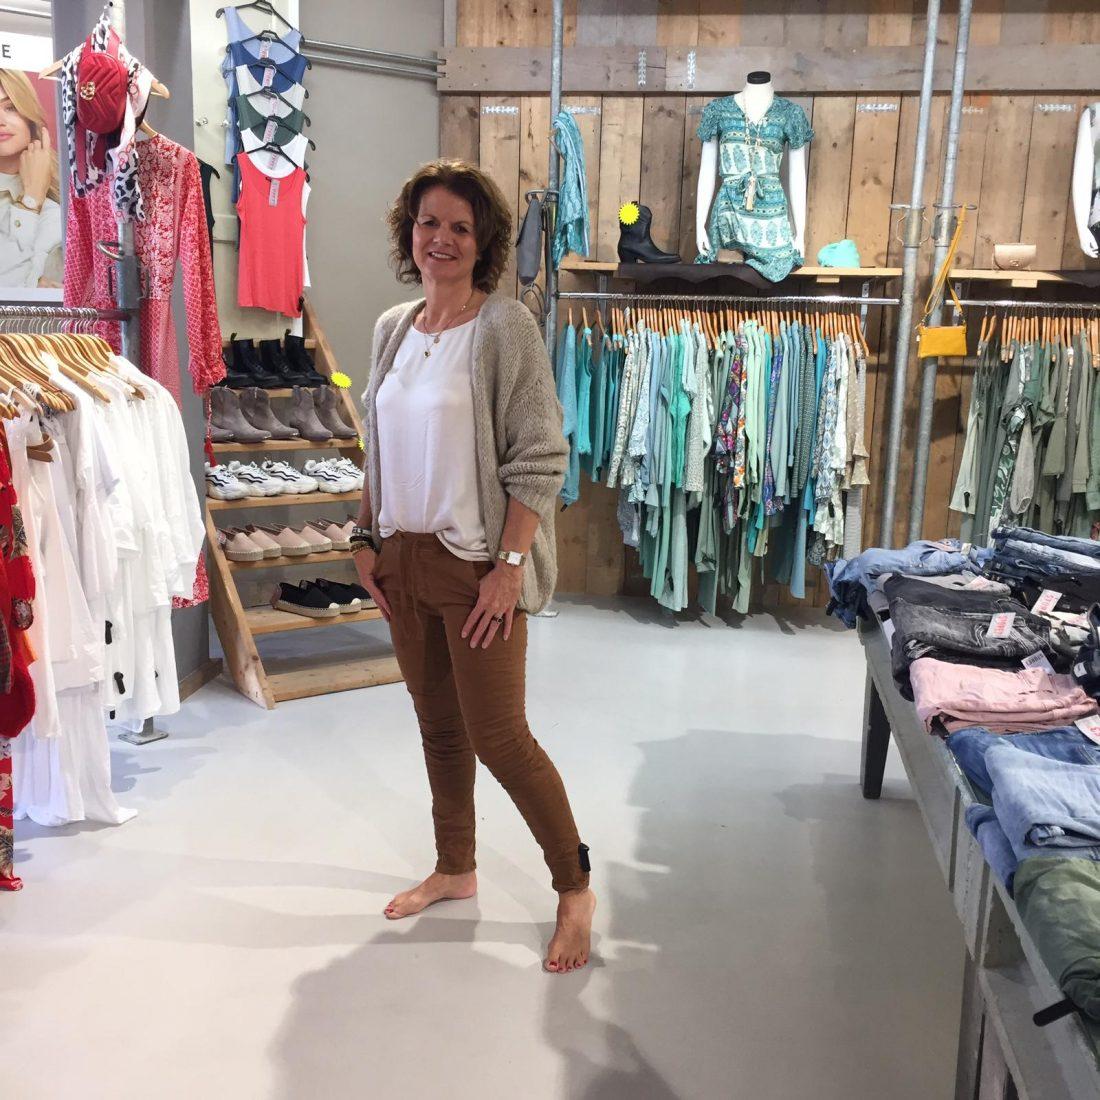 Vest Beige Gebreid Anelie & Gemma Ricceri Shirt Carin Beige & Melly & Co Broek Belle Bruin